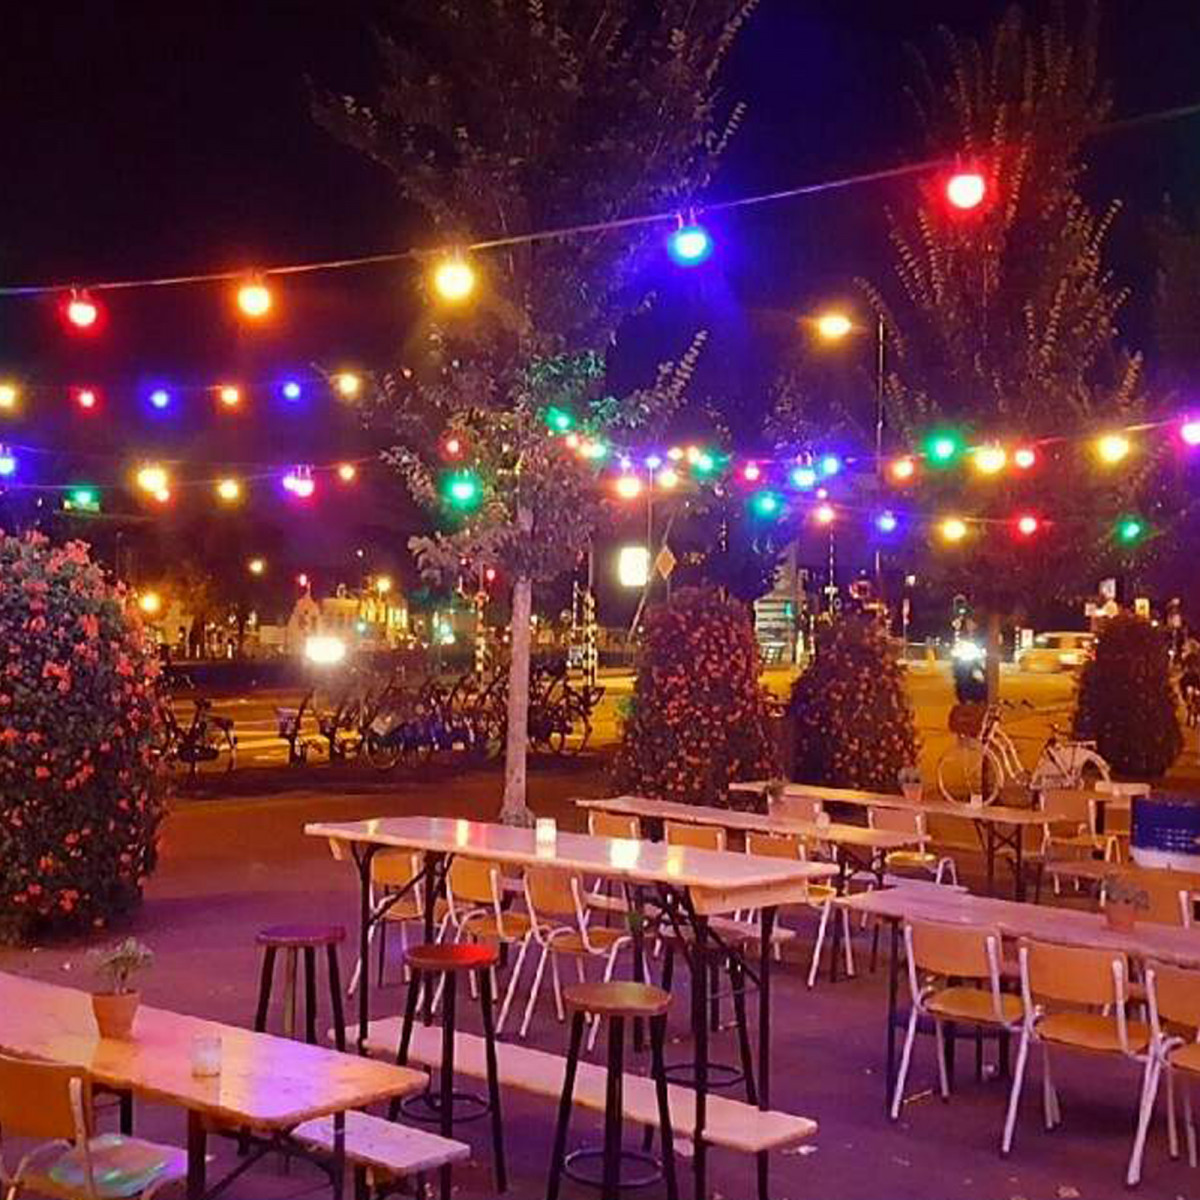 Partybeleuchtung LED Patio 30 Farben - 30 Meter / 36 Leuchten